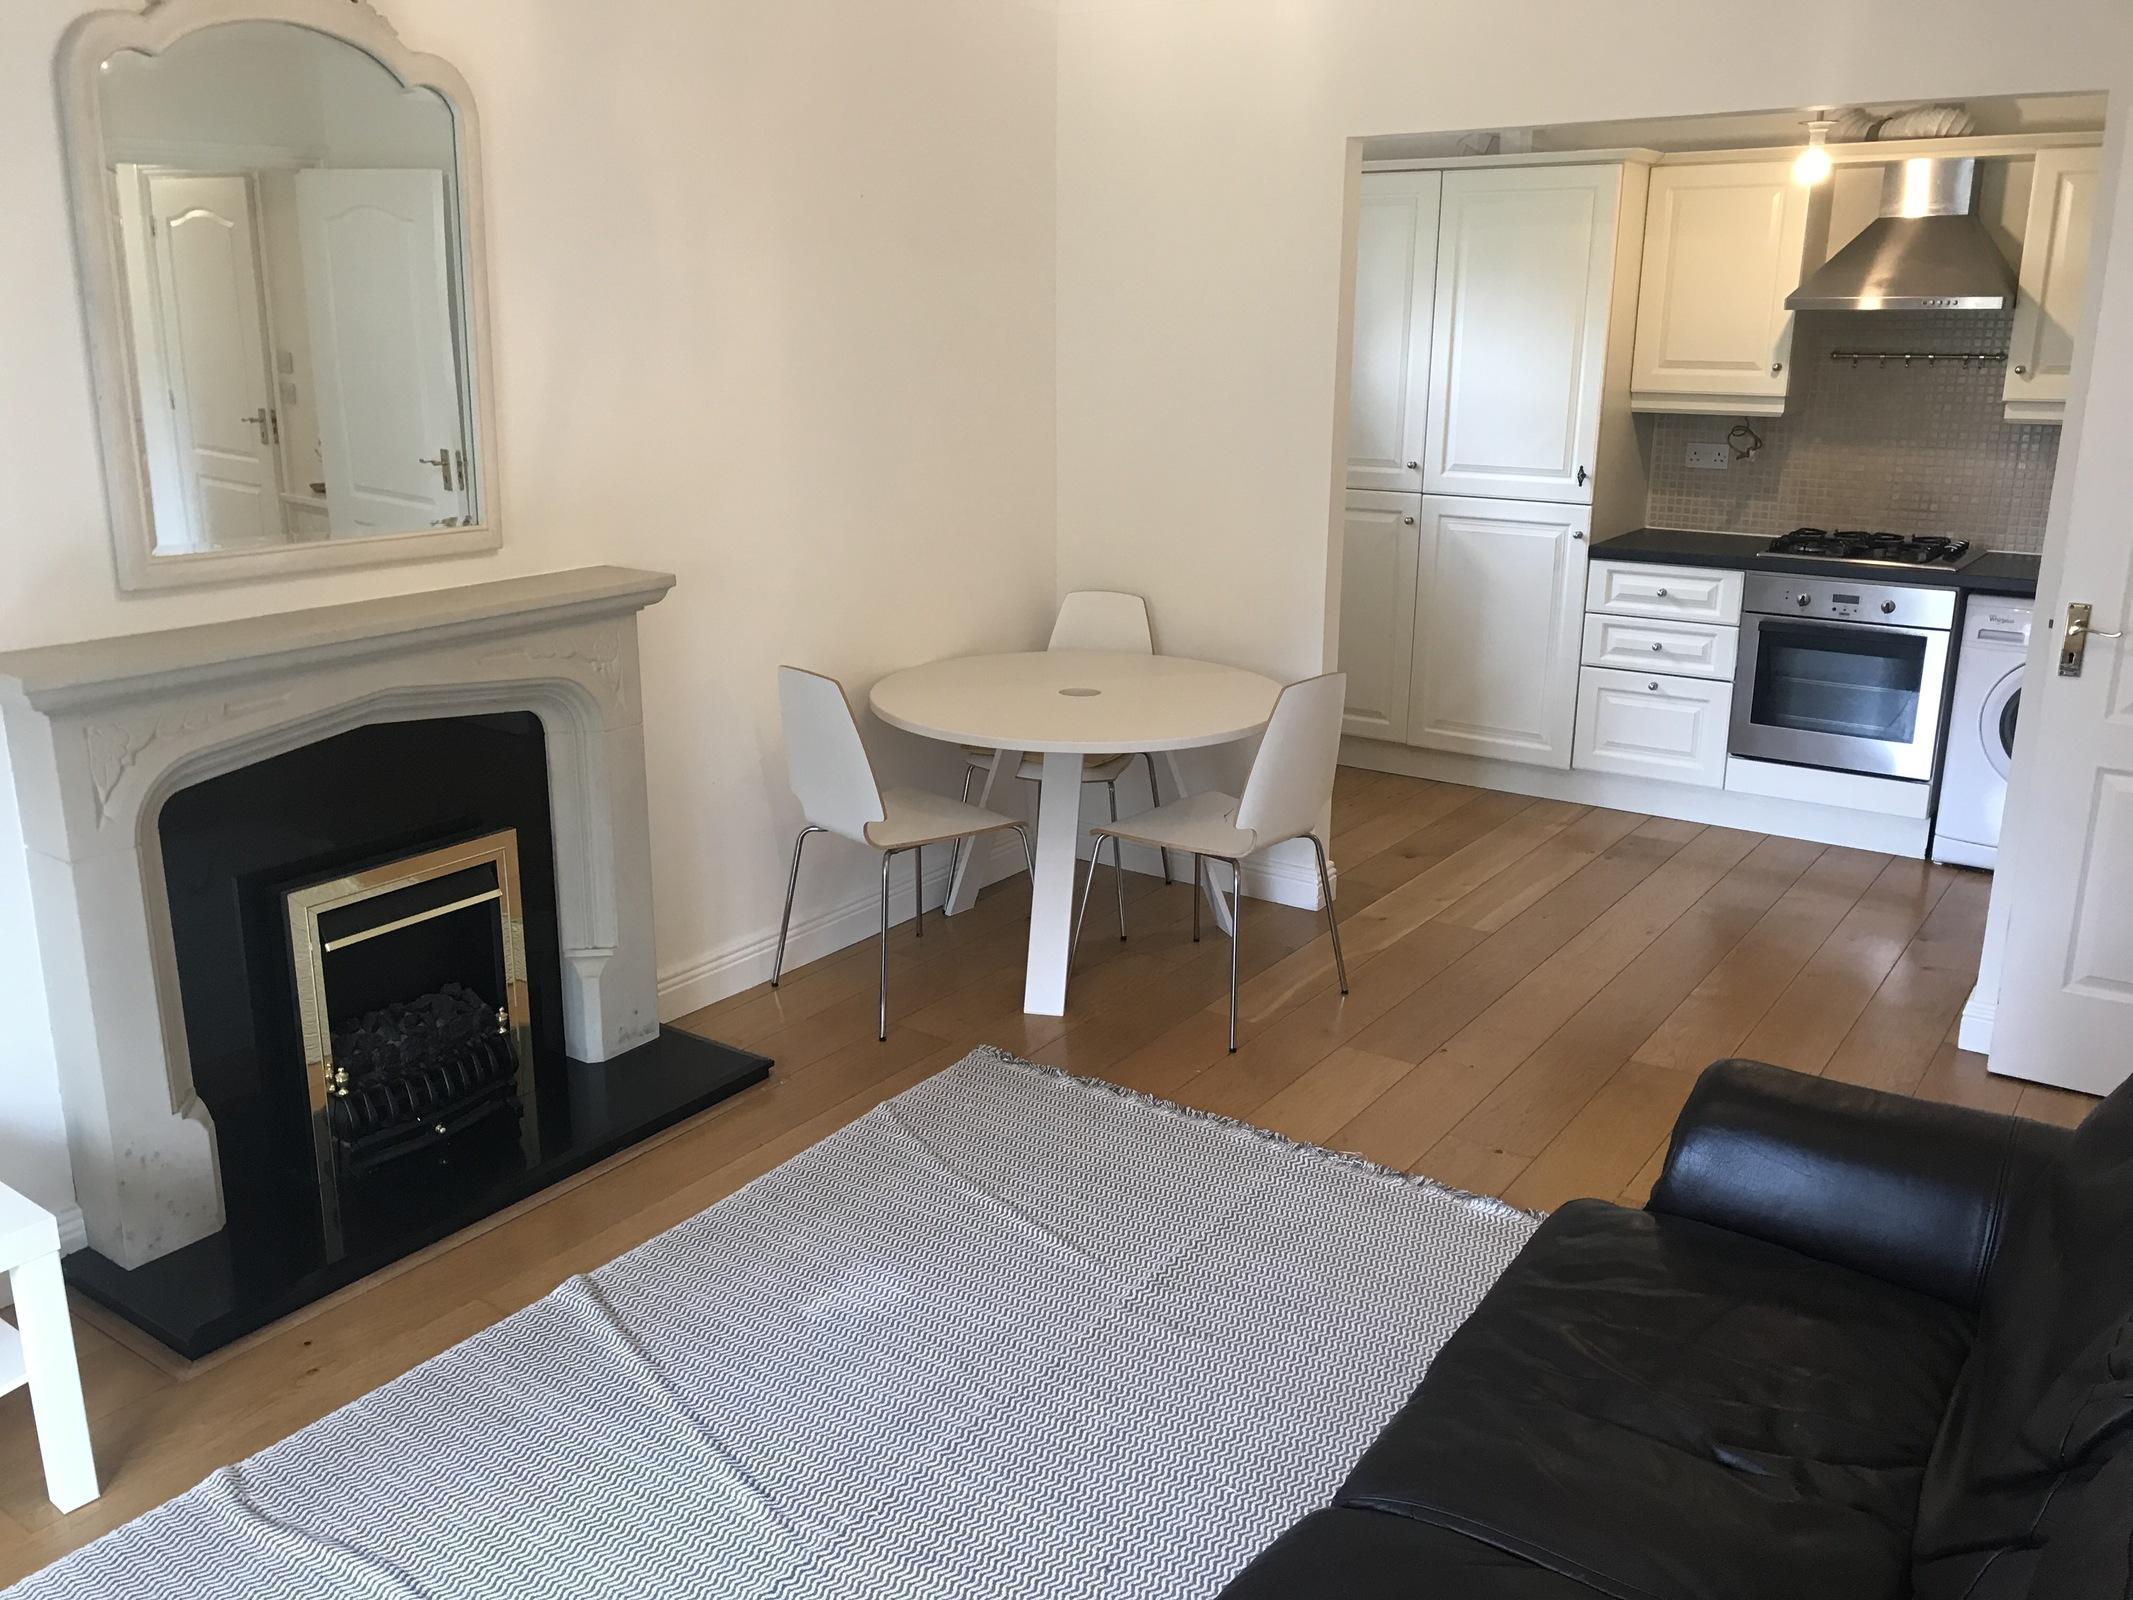 Apartment 83, Kerrymount, Castle Court, Kilgobbin, Sandyford, Dublin 18